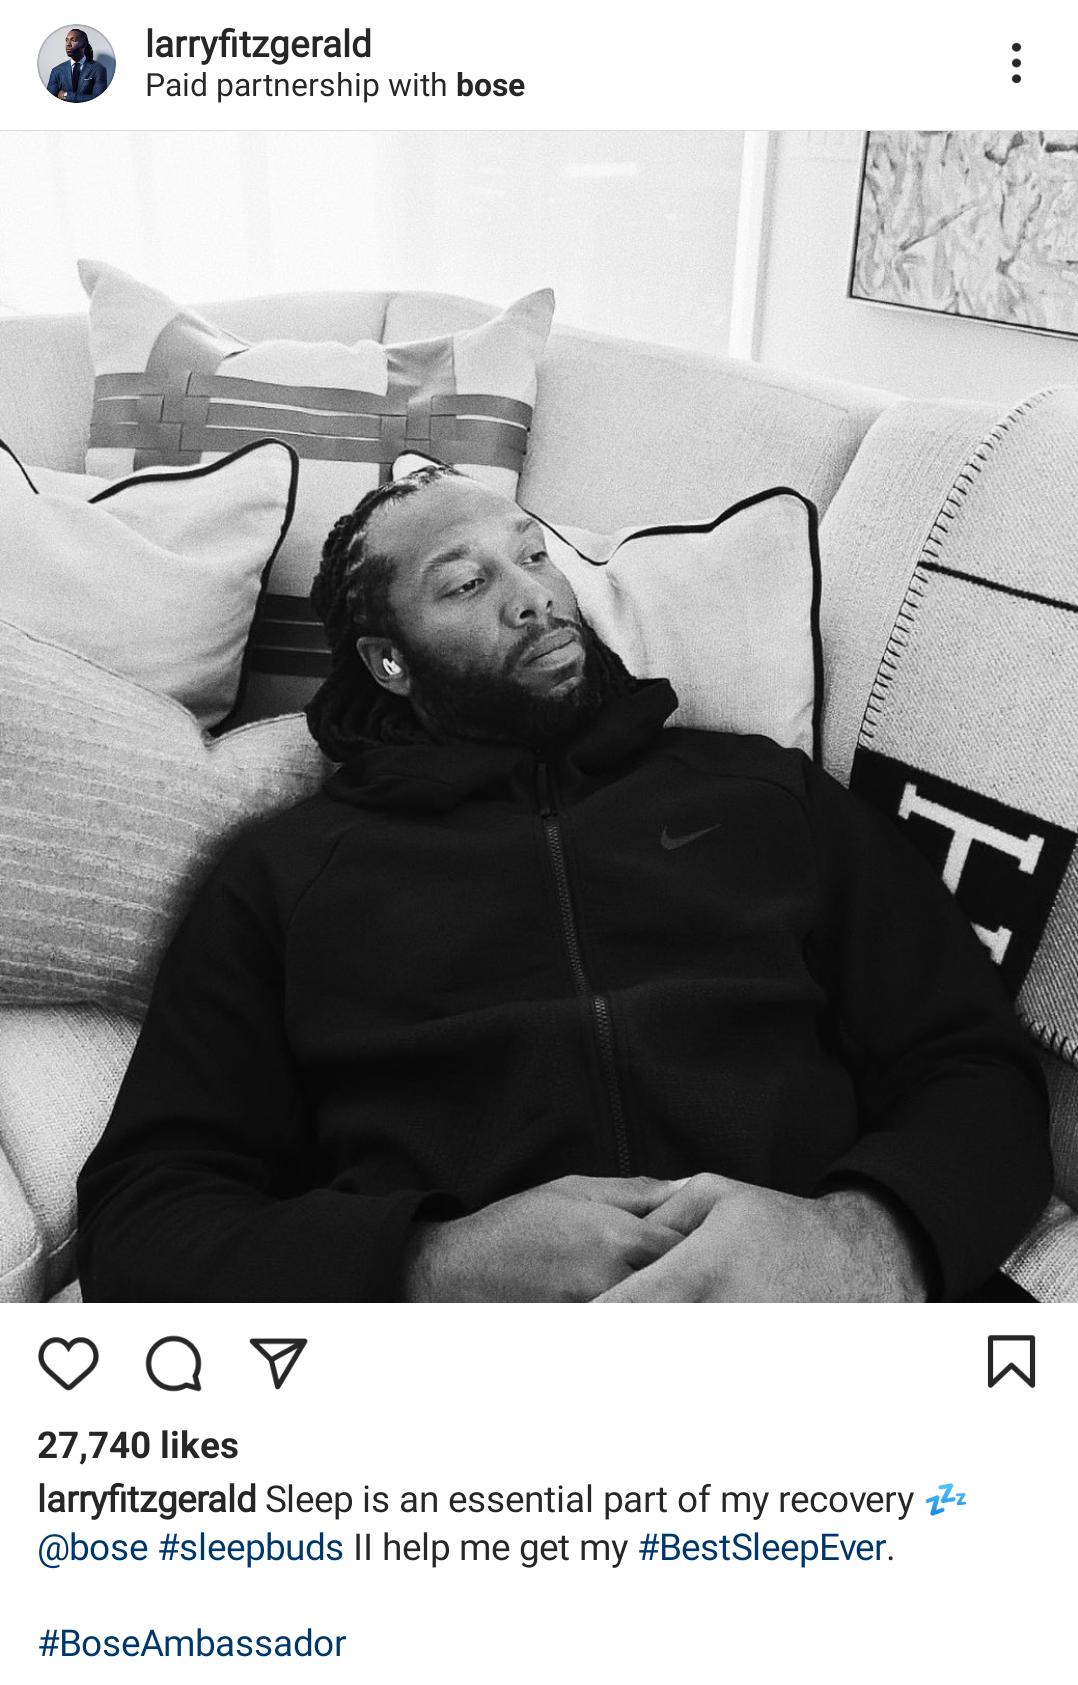 Bose Larry Fitzgerald Instagram